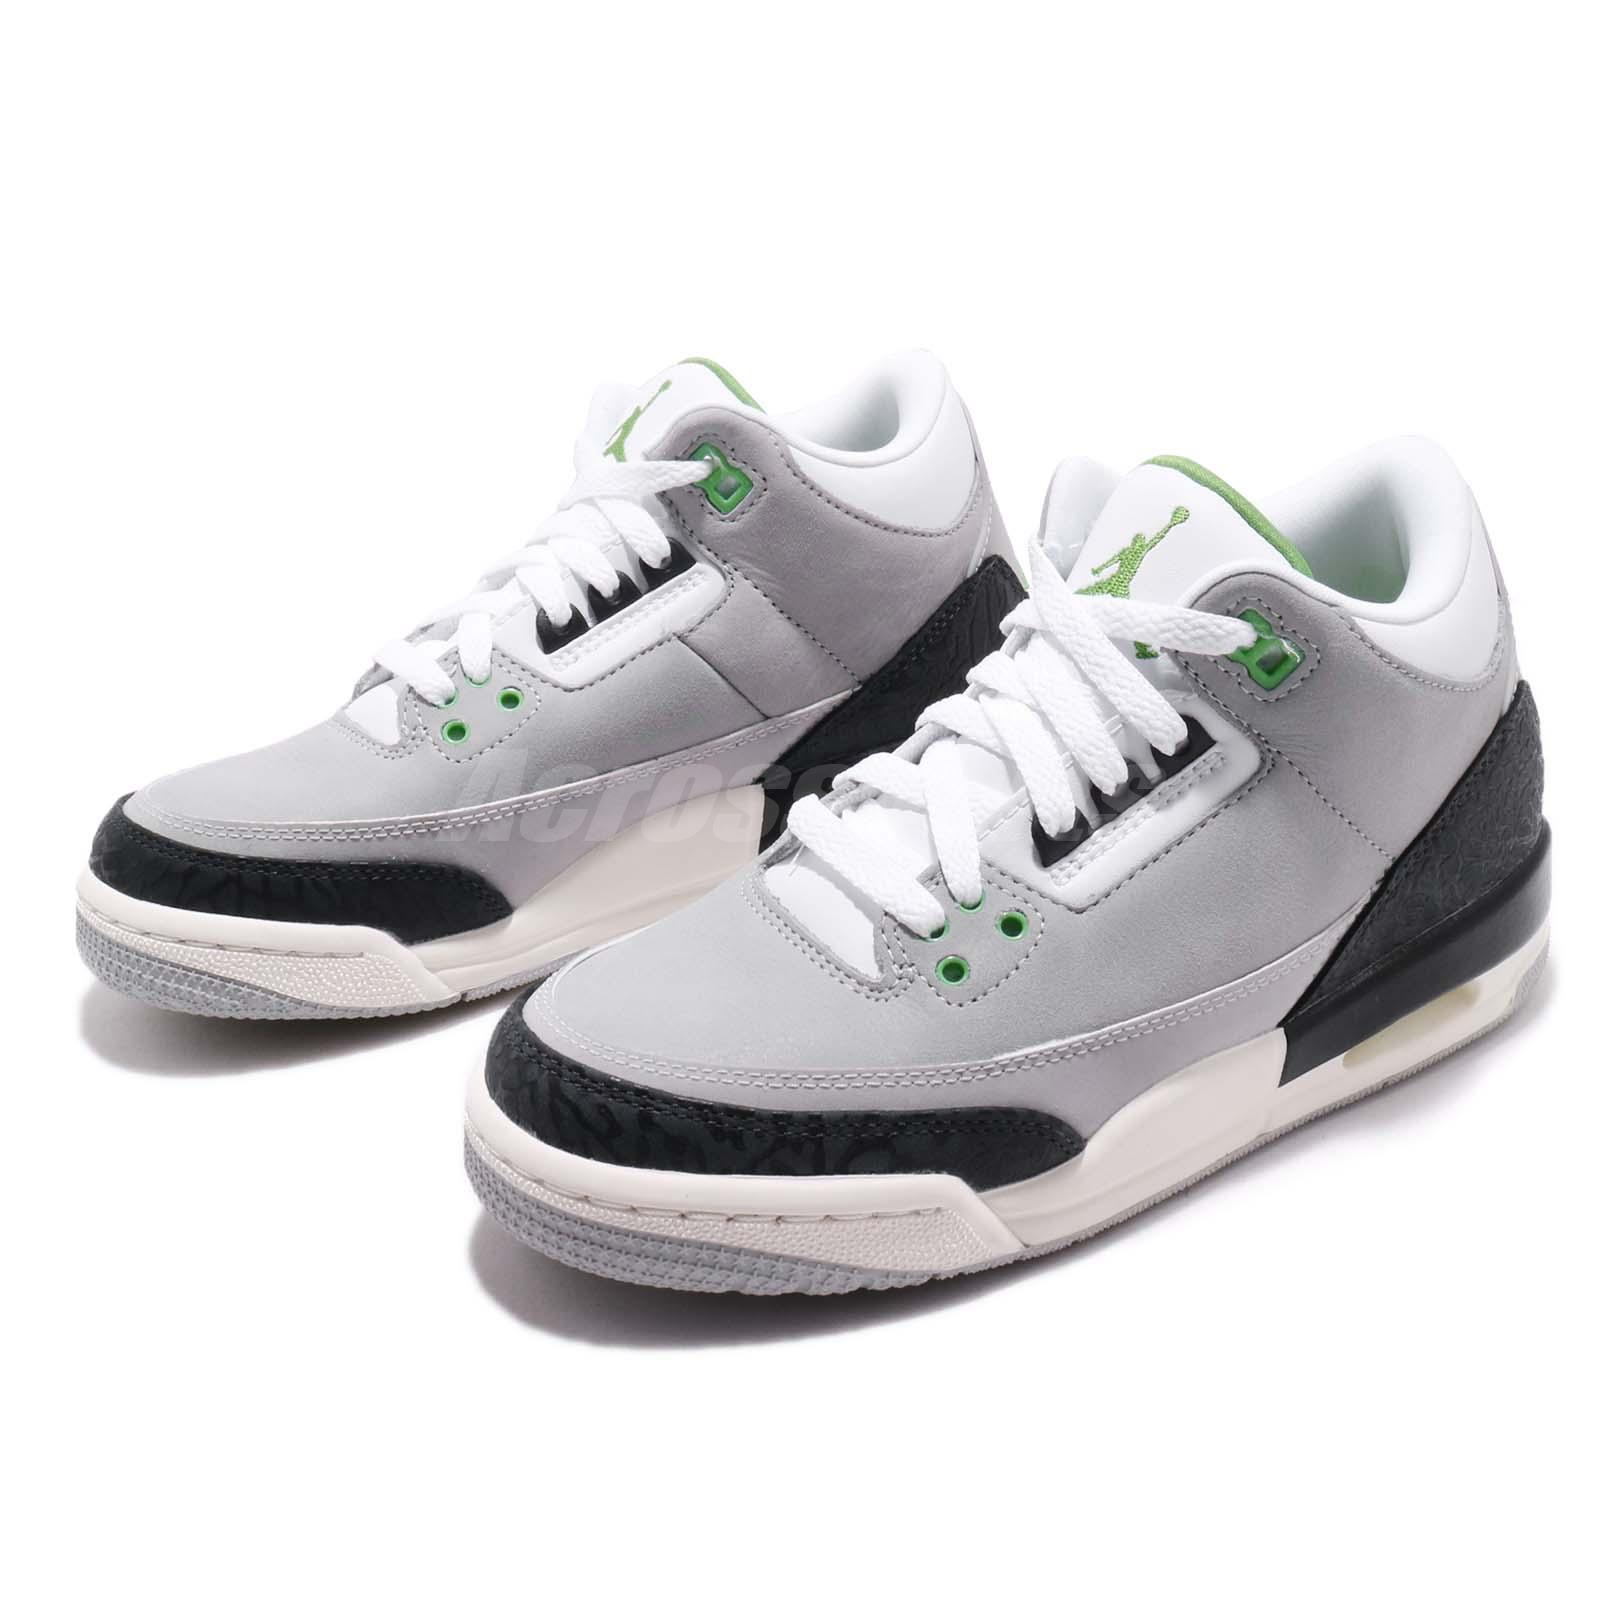 new style 950bf d247e Details about Nike Air Jordan 3 Retro BG Chlorophyll Tinker Green Kid Women  Shoes 398614-006